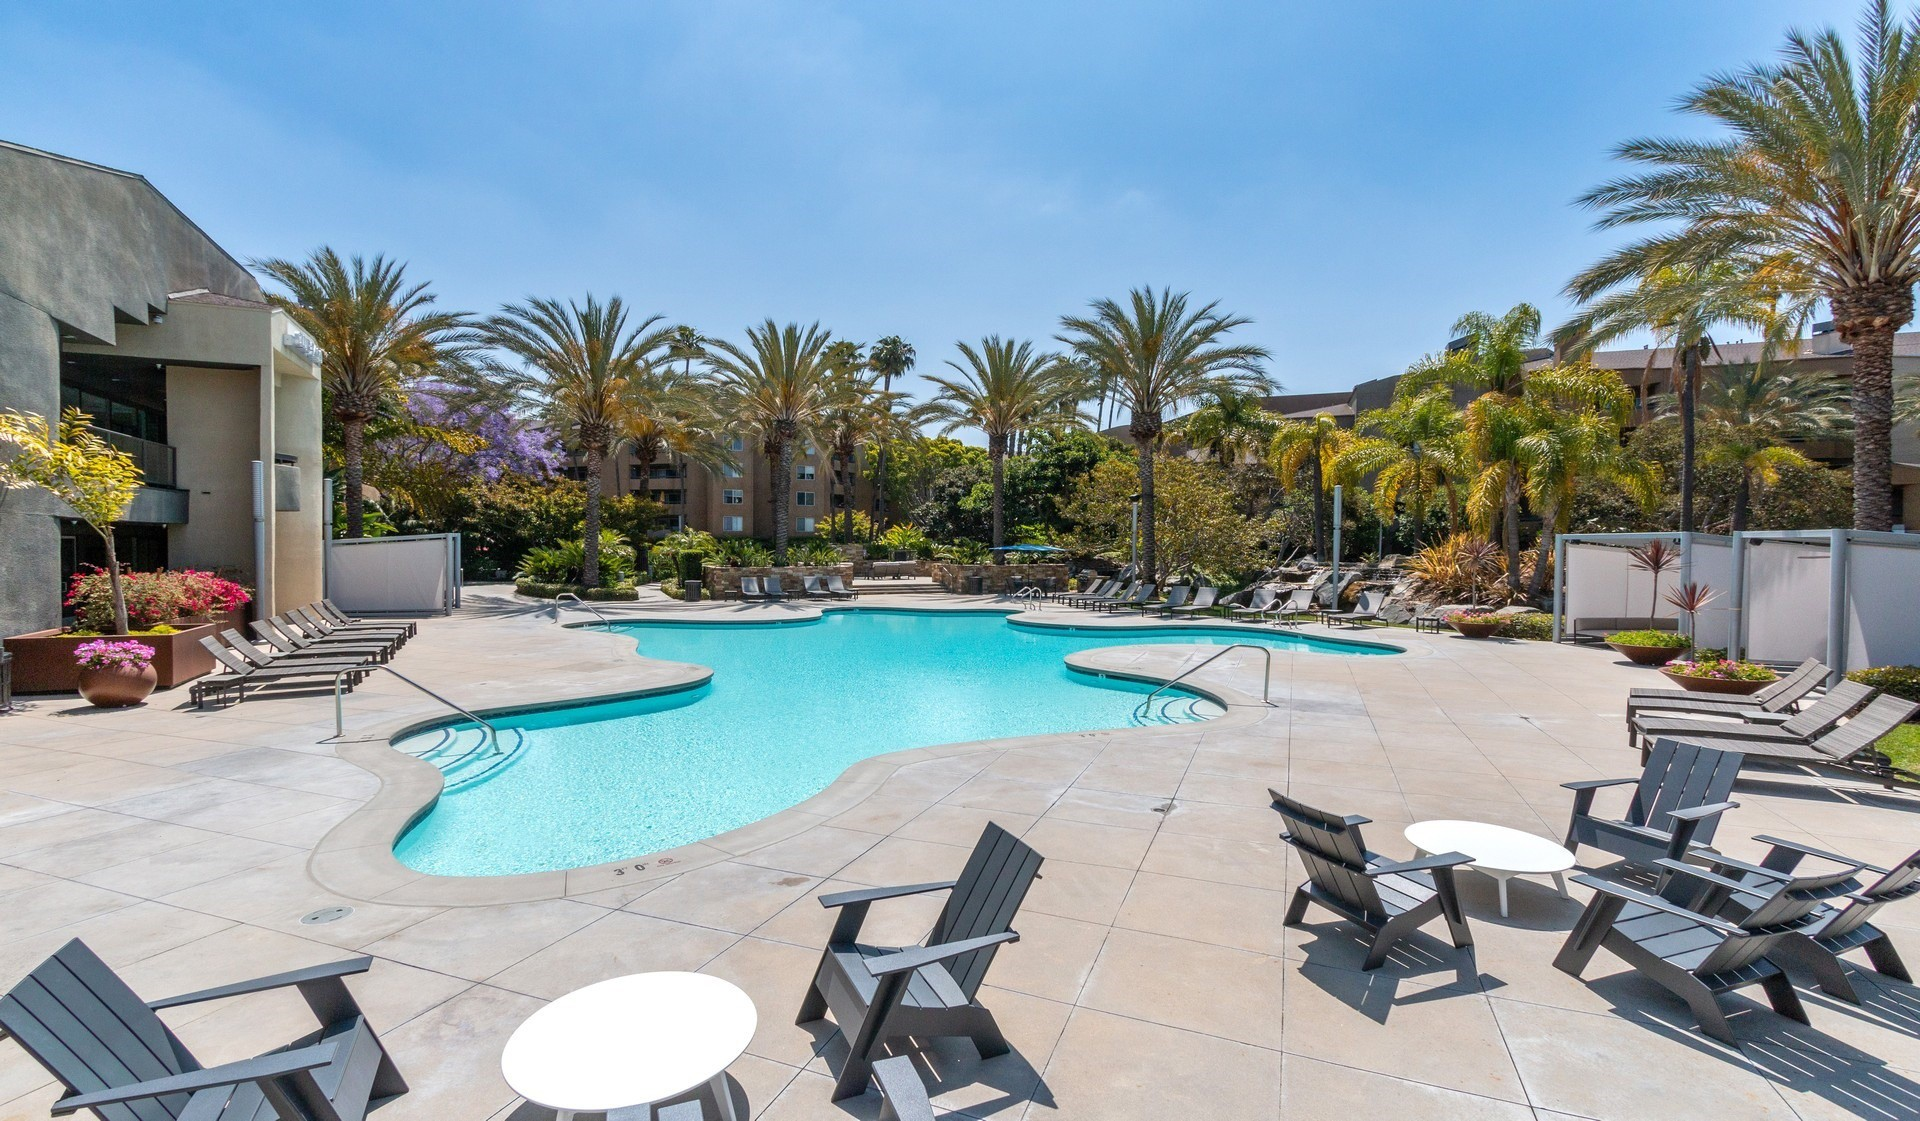 Apartments Near CCCD 3400 Avenue of the Arts for Coast Community College District Students in Coasta Mesa, CA